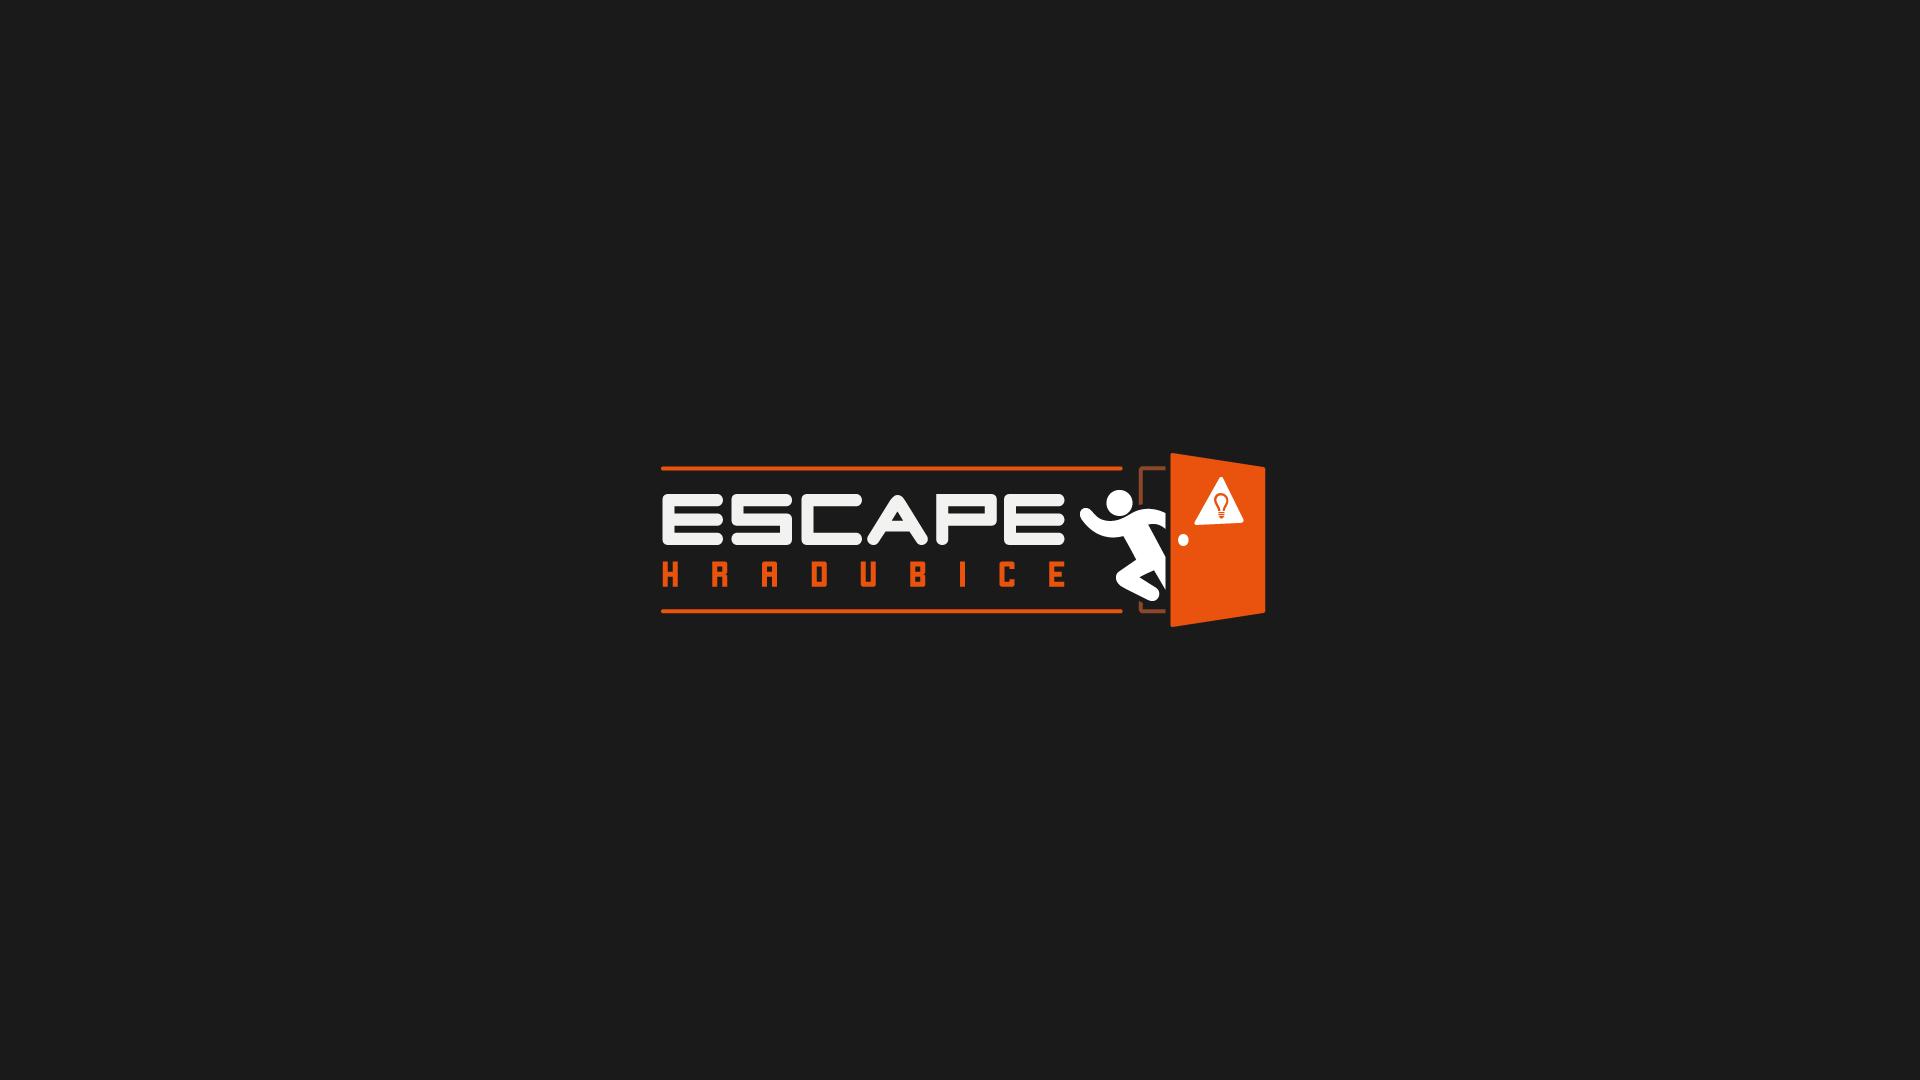 Logo Escape Hradubice